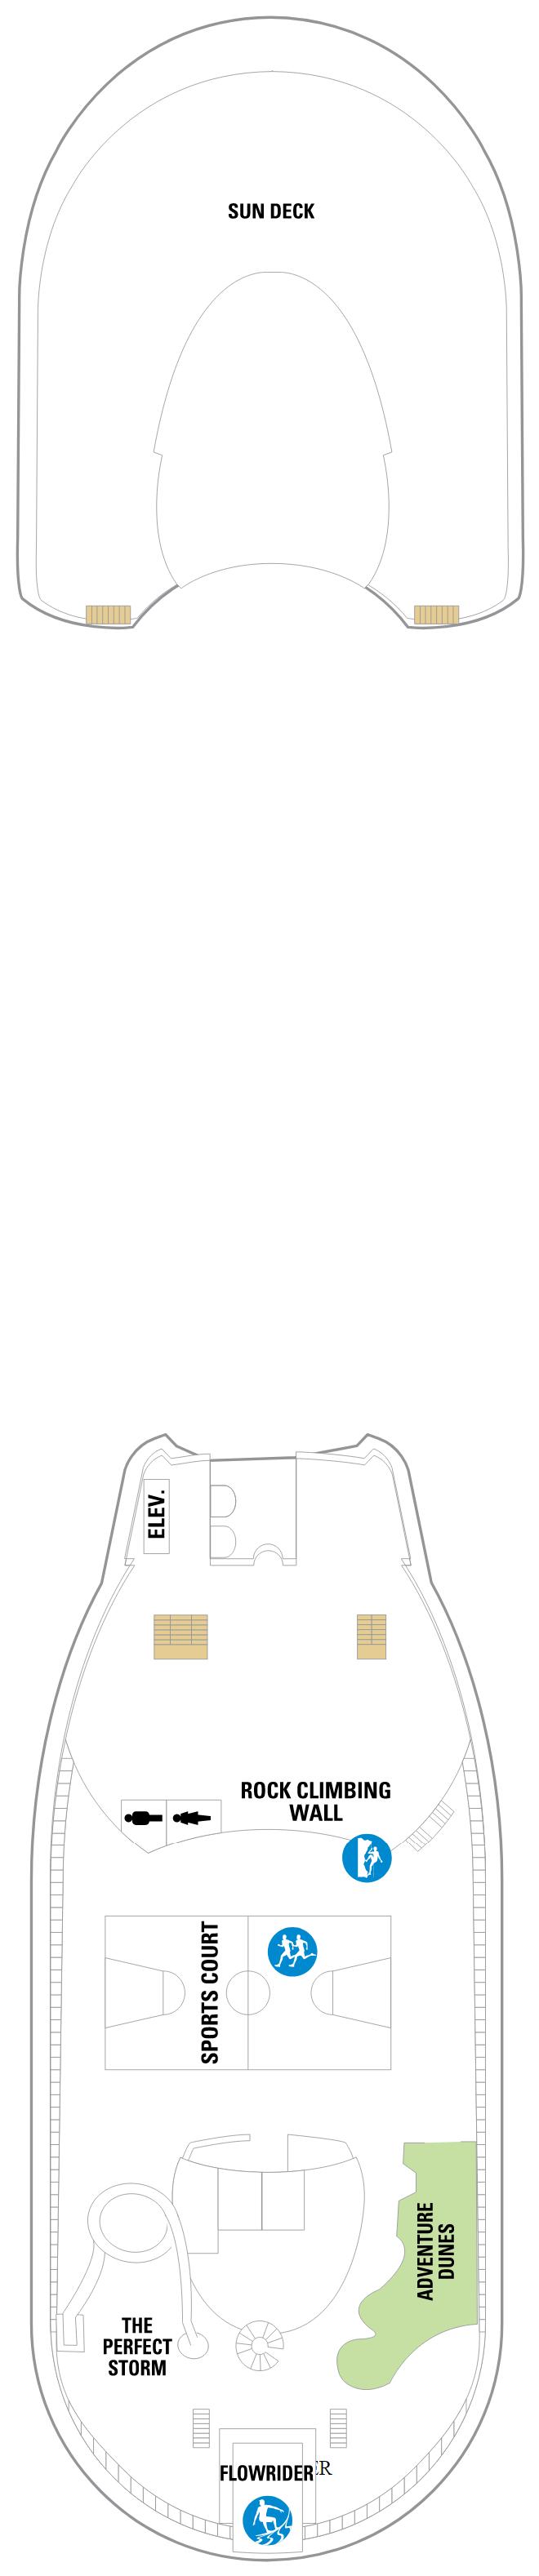 Deck 13 (April 21st, 2021 - April 30th, 2022)